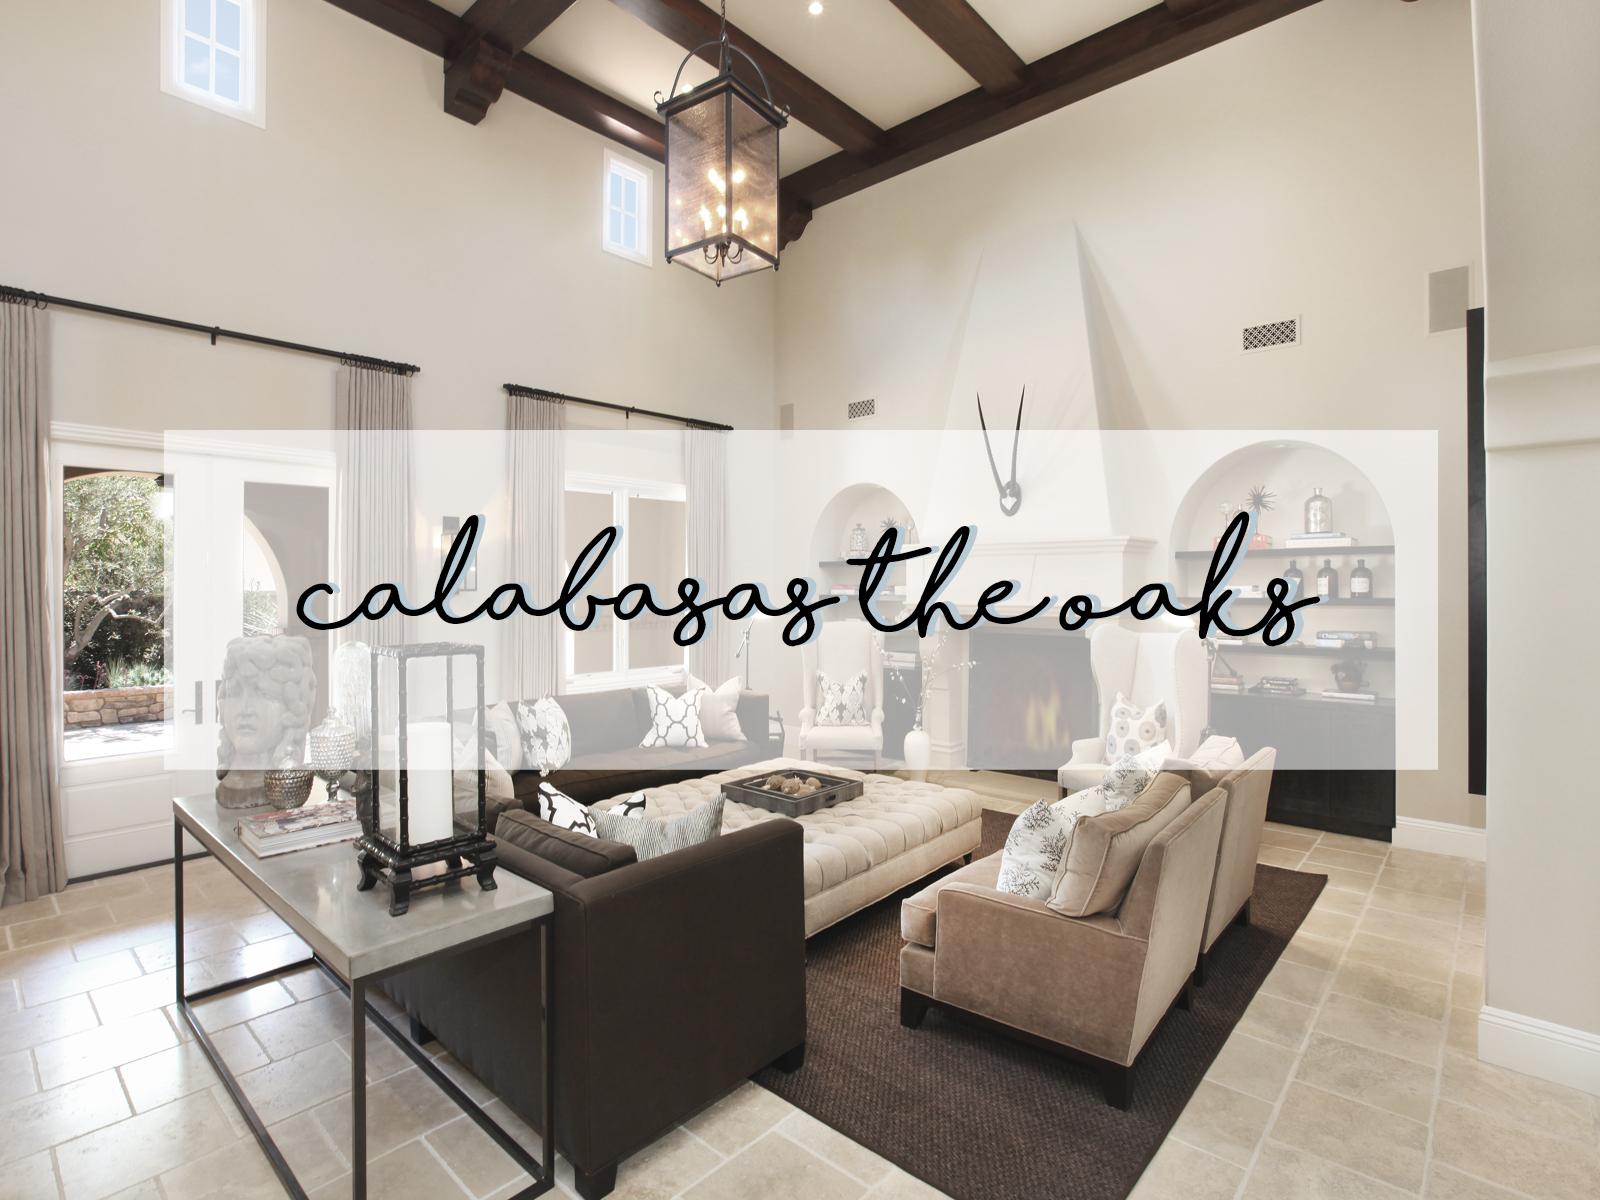 blackband_design_calabasas_the_oaks-1